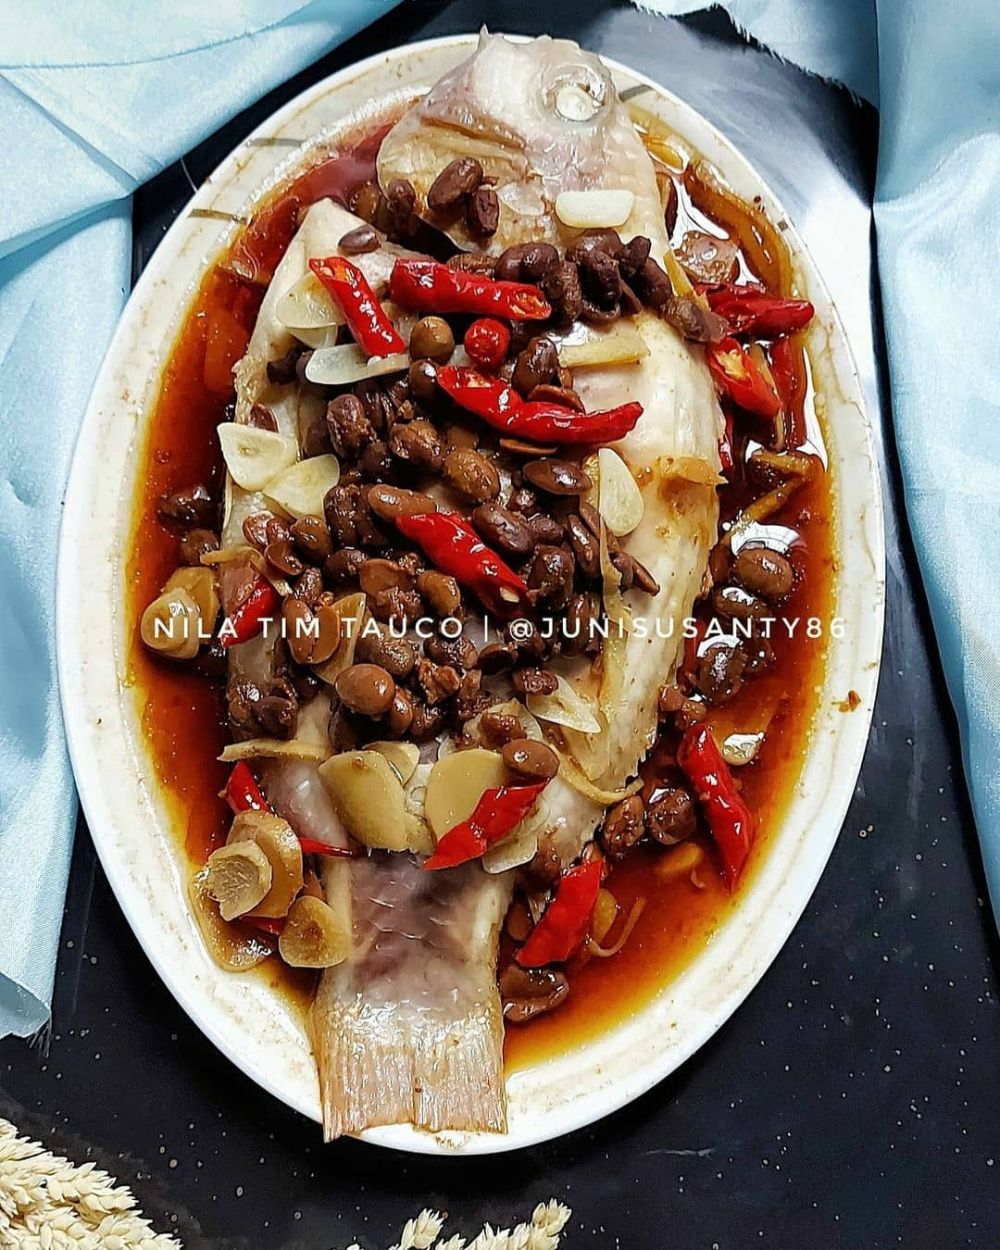 Resep olahan ikan nila sederhana © berbagai sumber